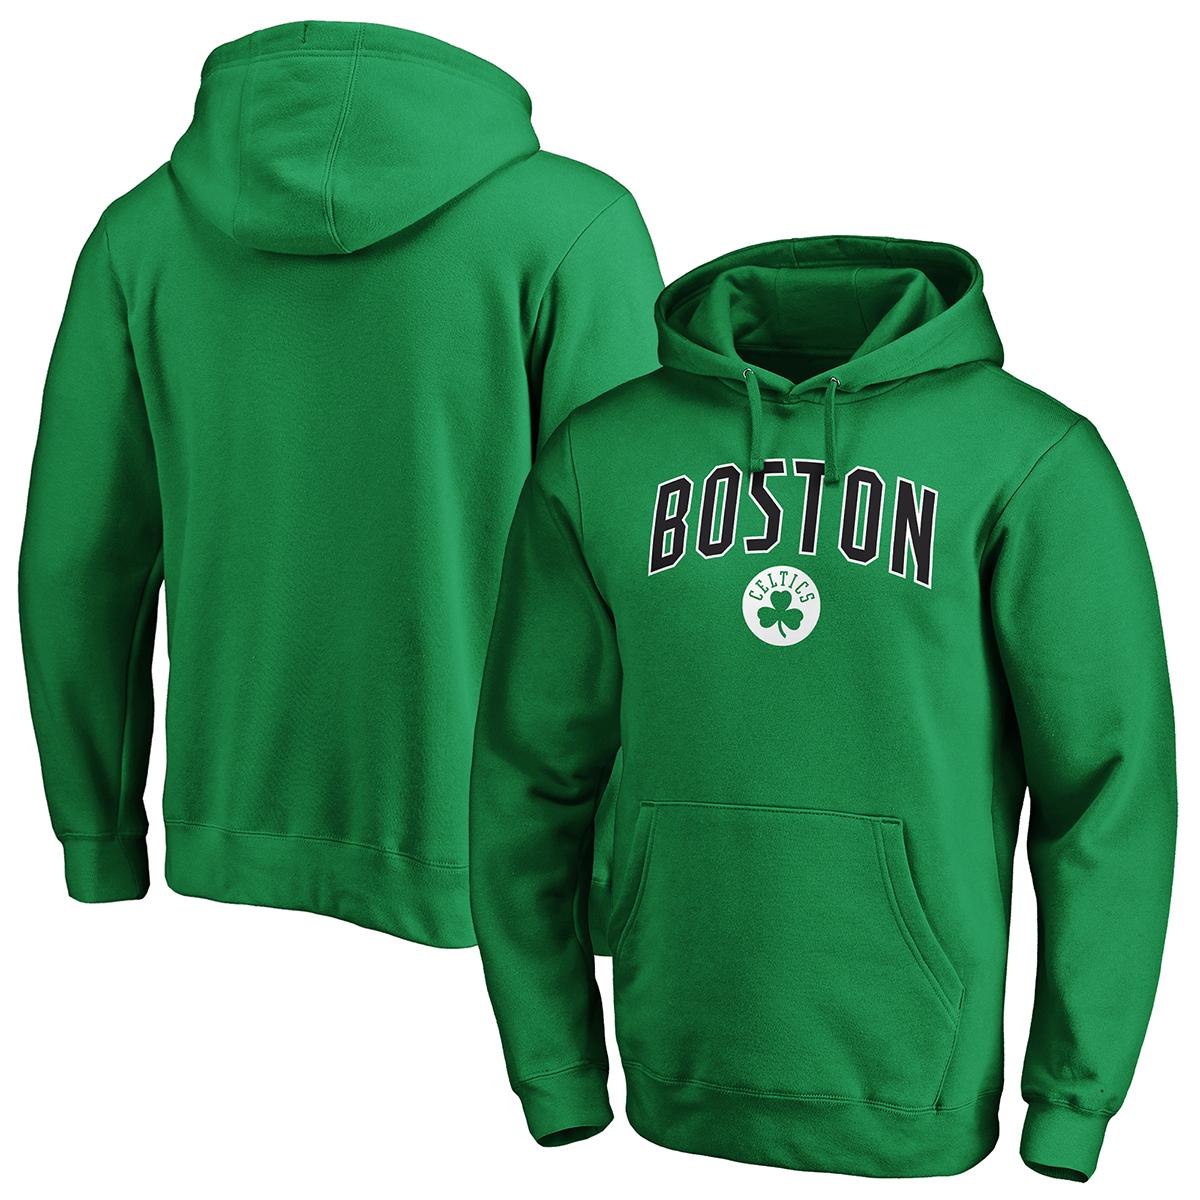 Boston Celtics Men's Engage Arch Pullover Hoodie - Green, XL